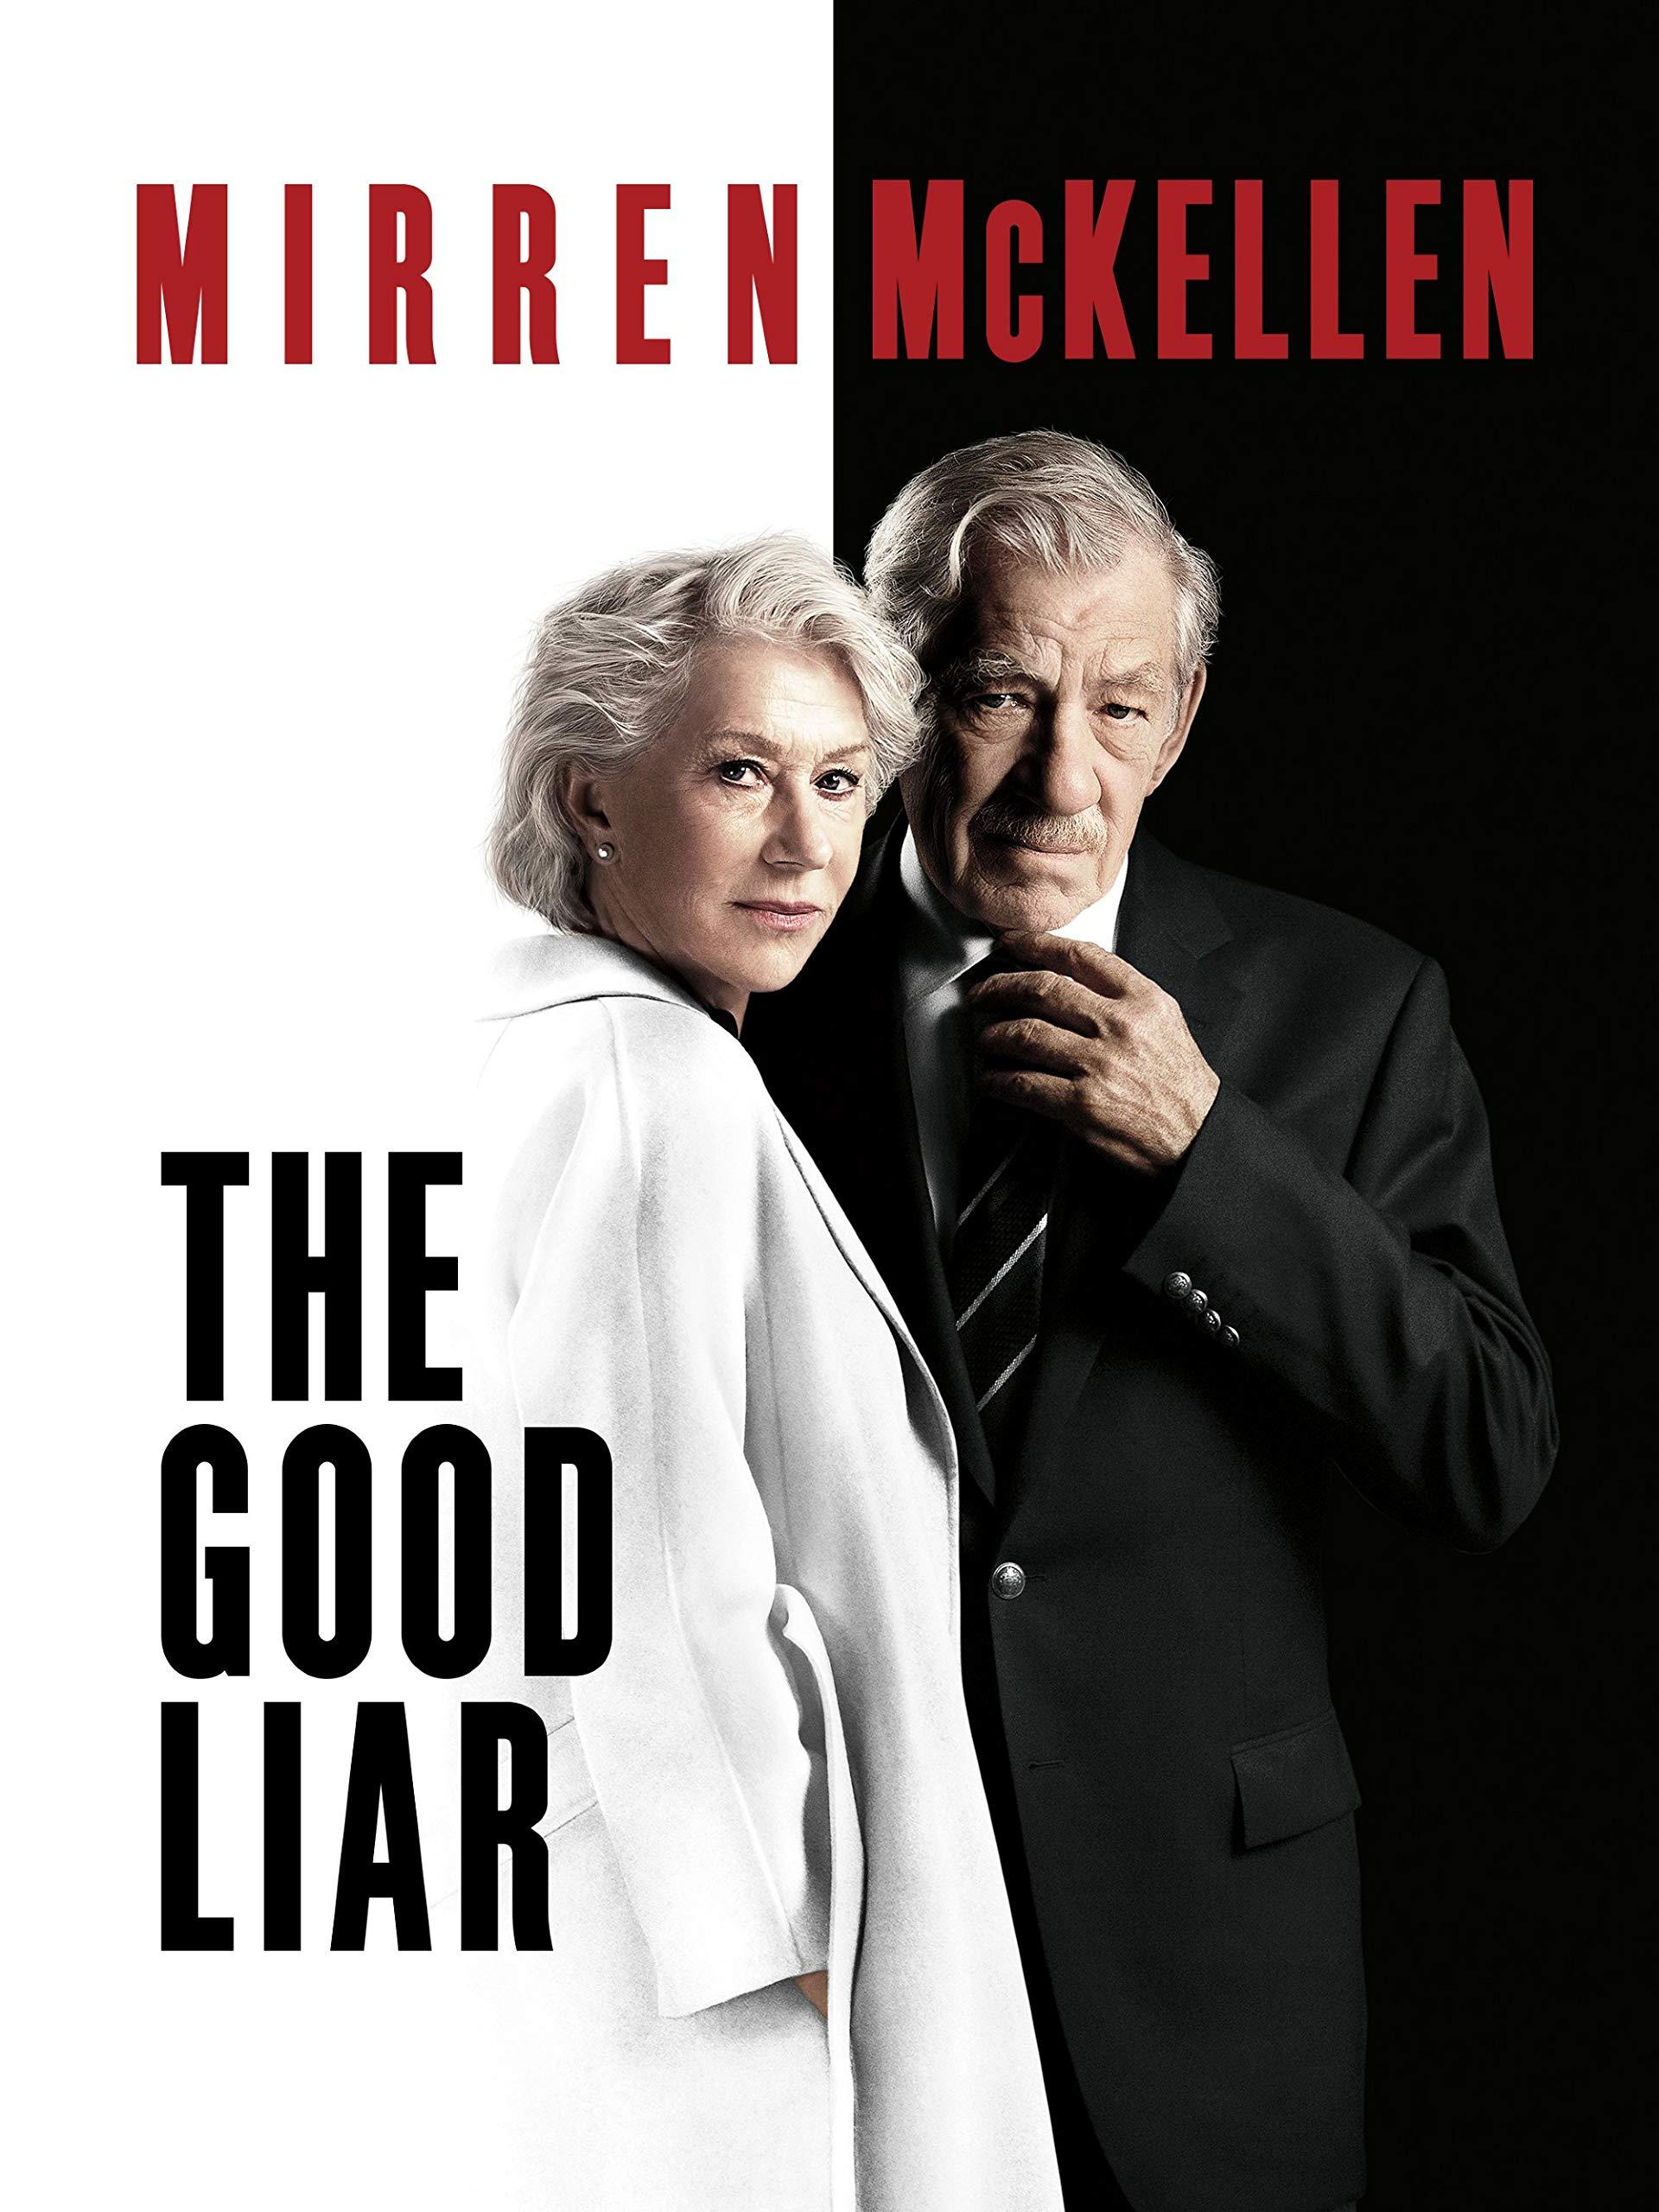 Liar Serie Amazon